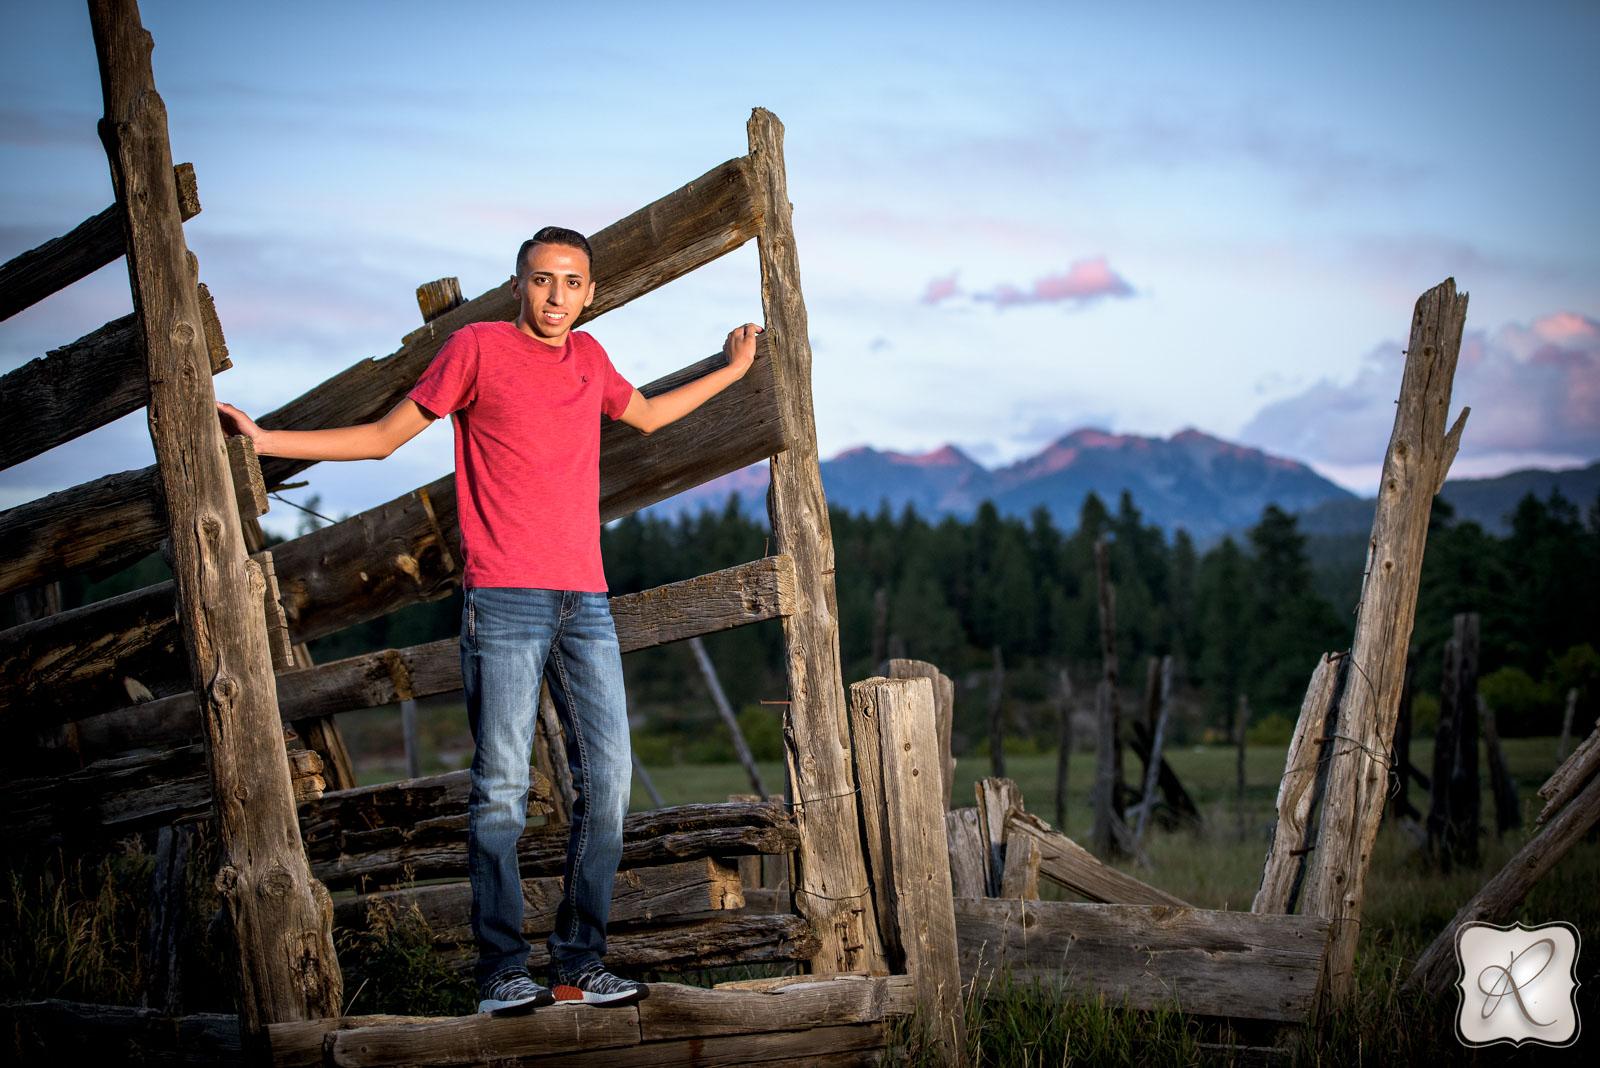 Photography by Allison Ragsdale in Durango Colorado